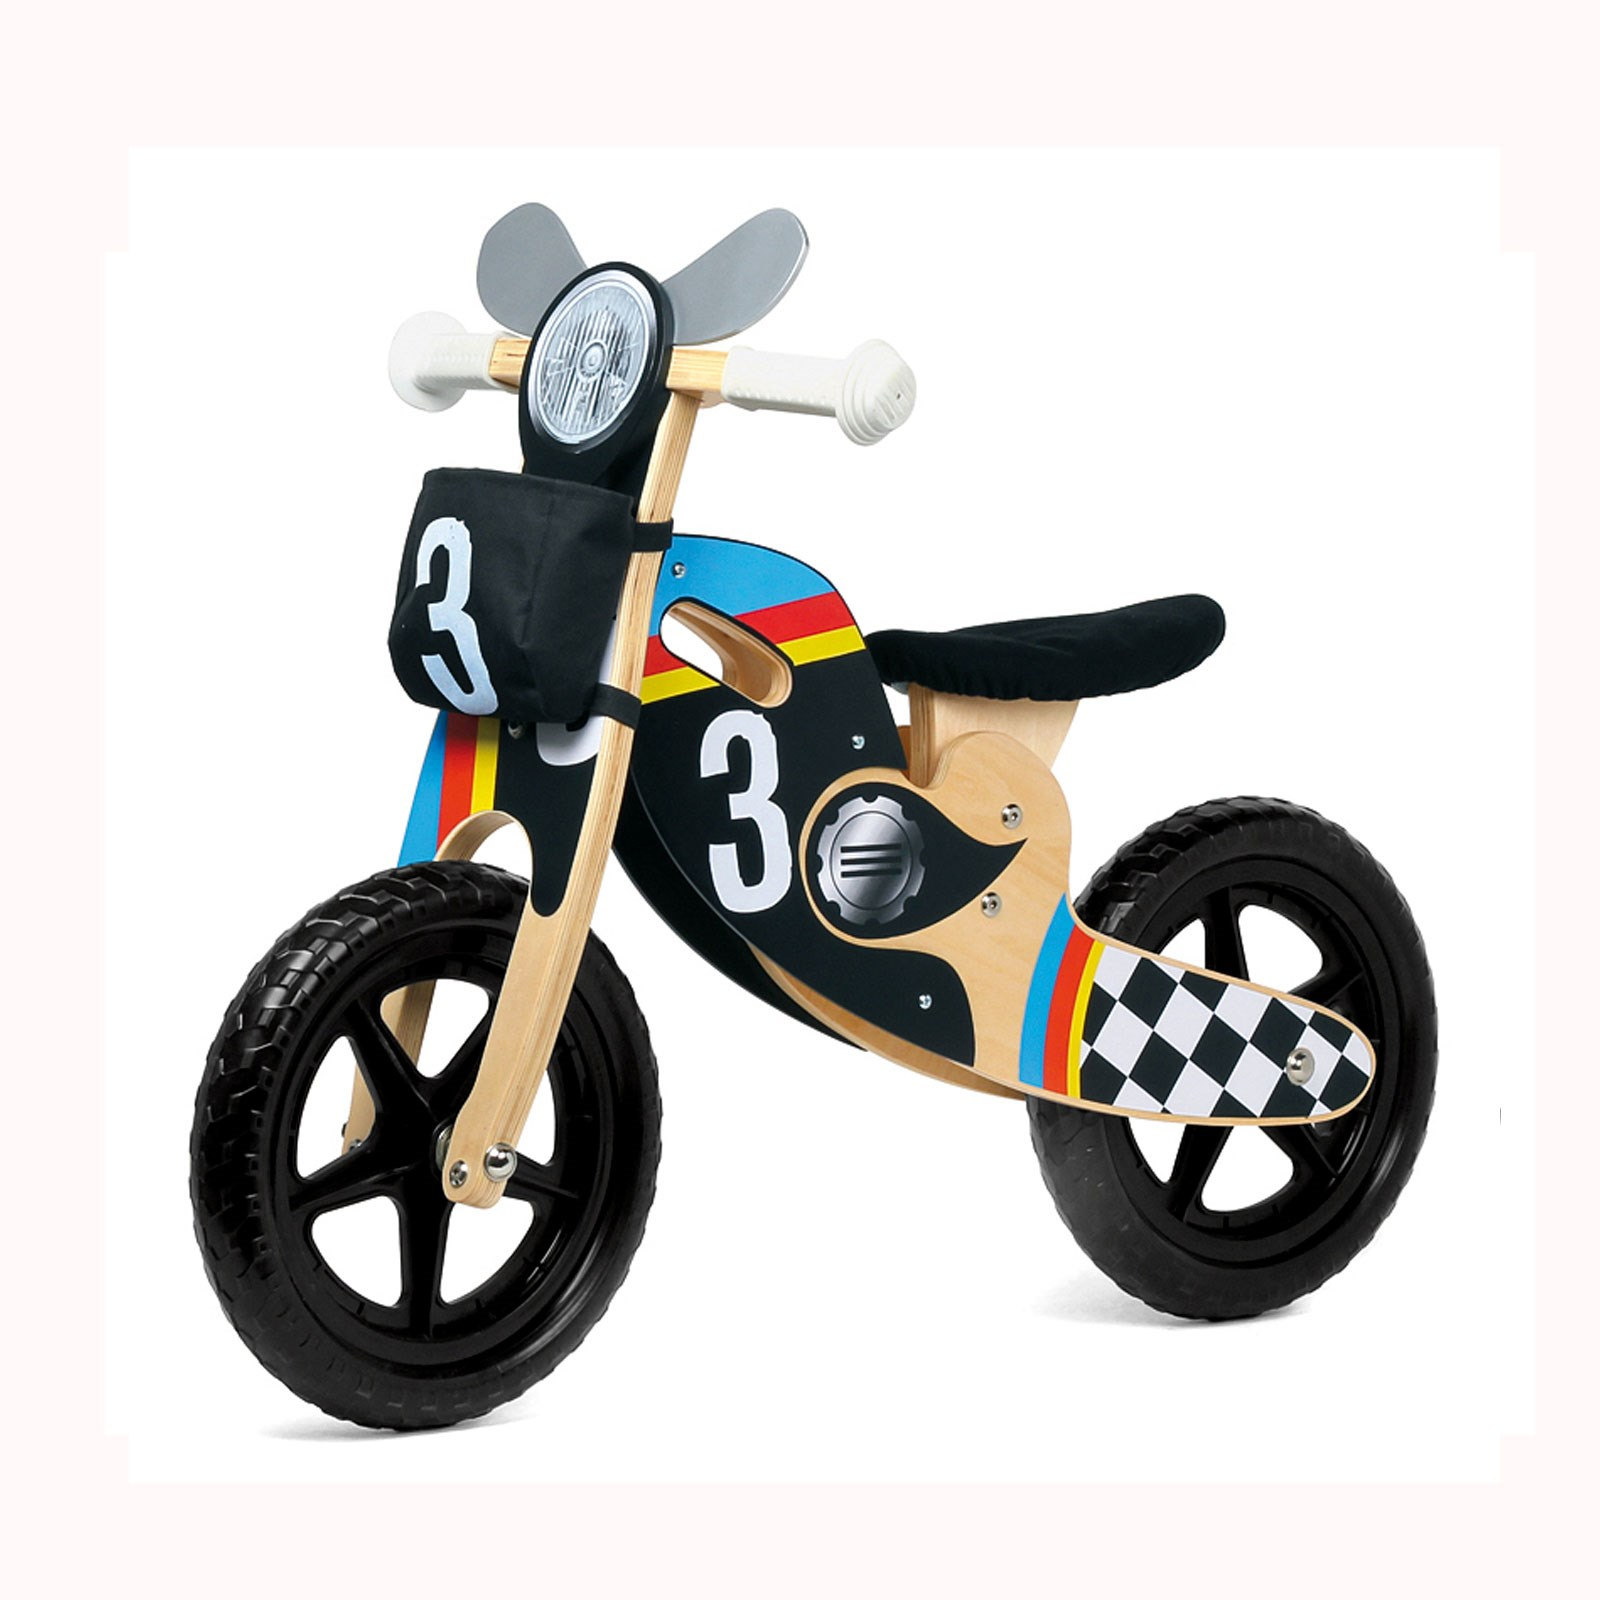 Kit moto pour premier vélo